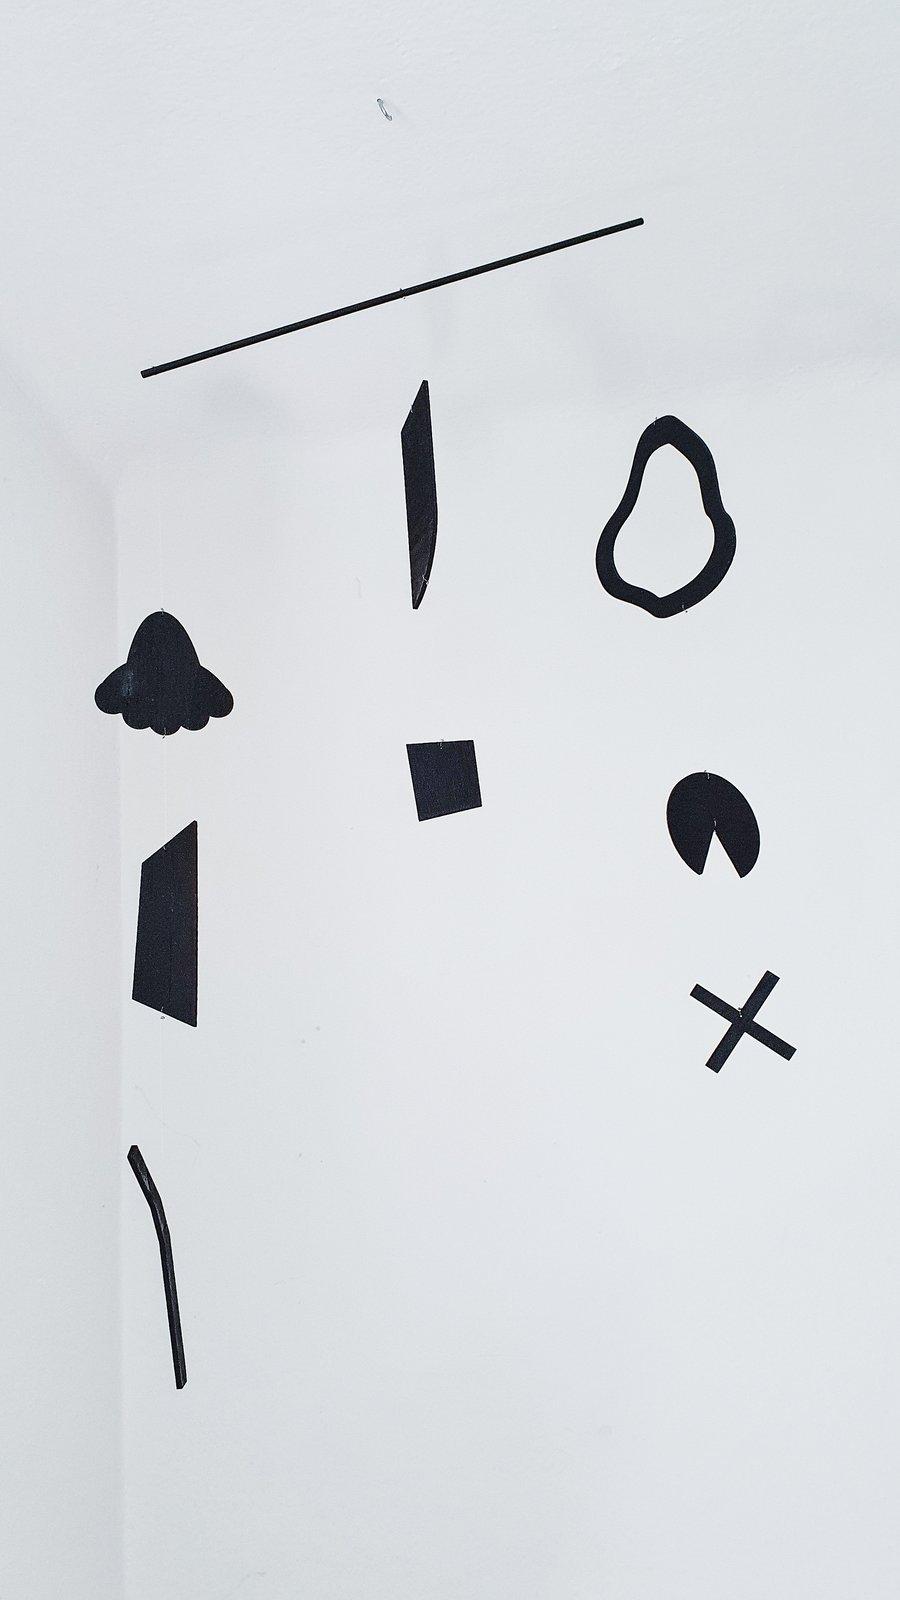 Image of dekorativni MOBILE 2 // decorative MOBILE 2